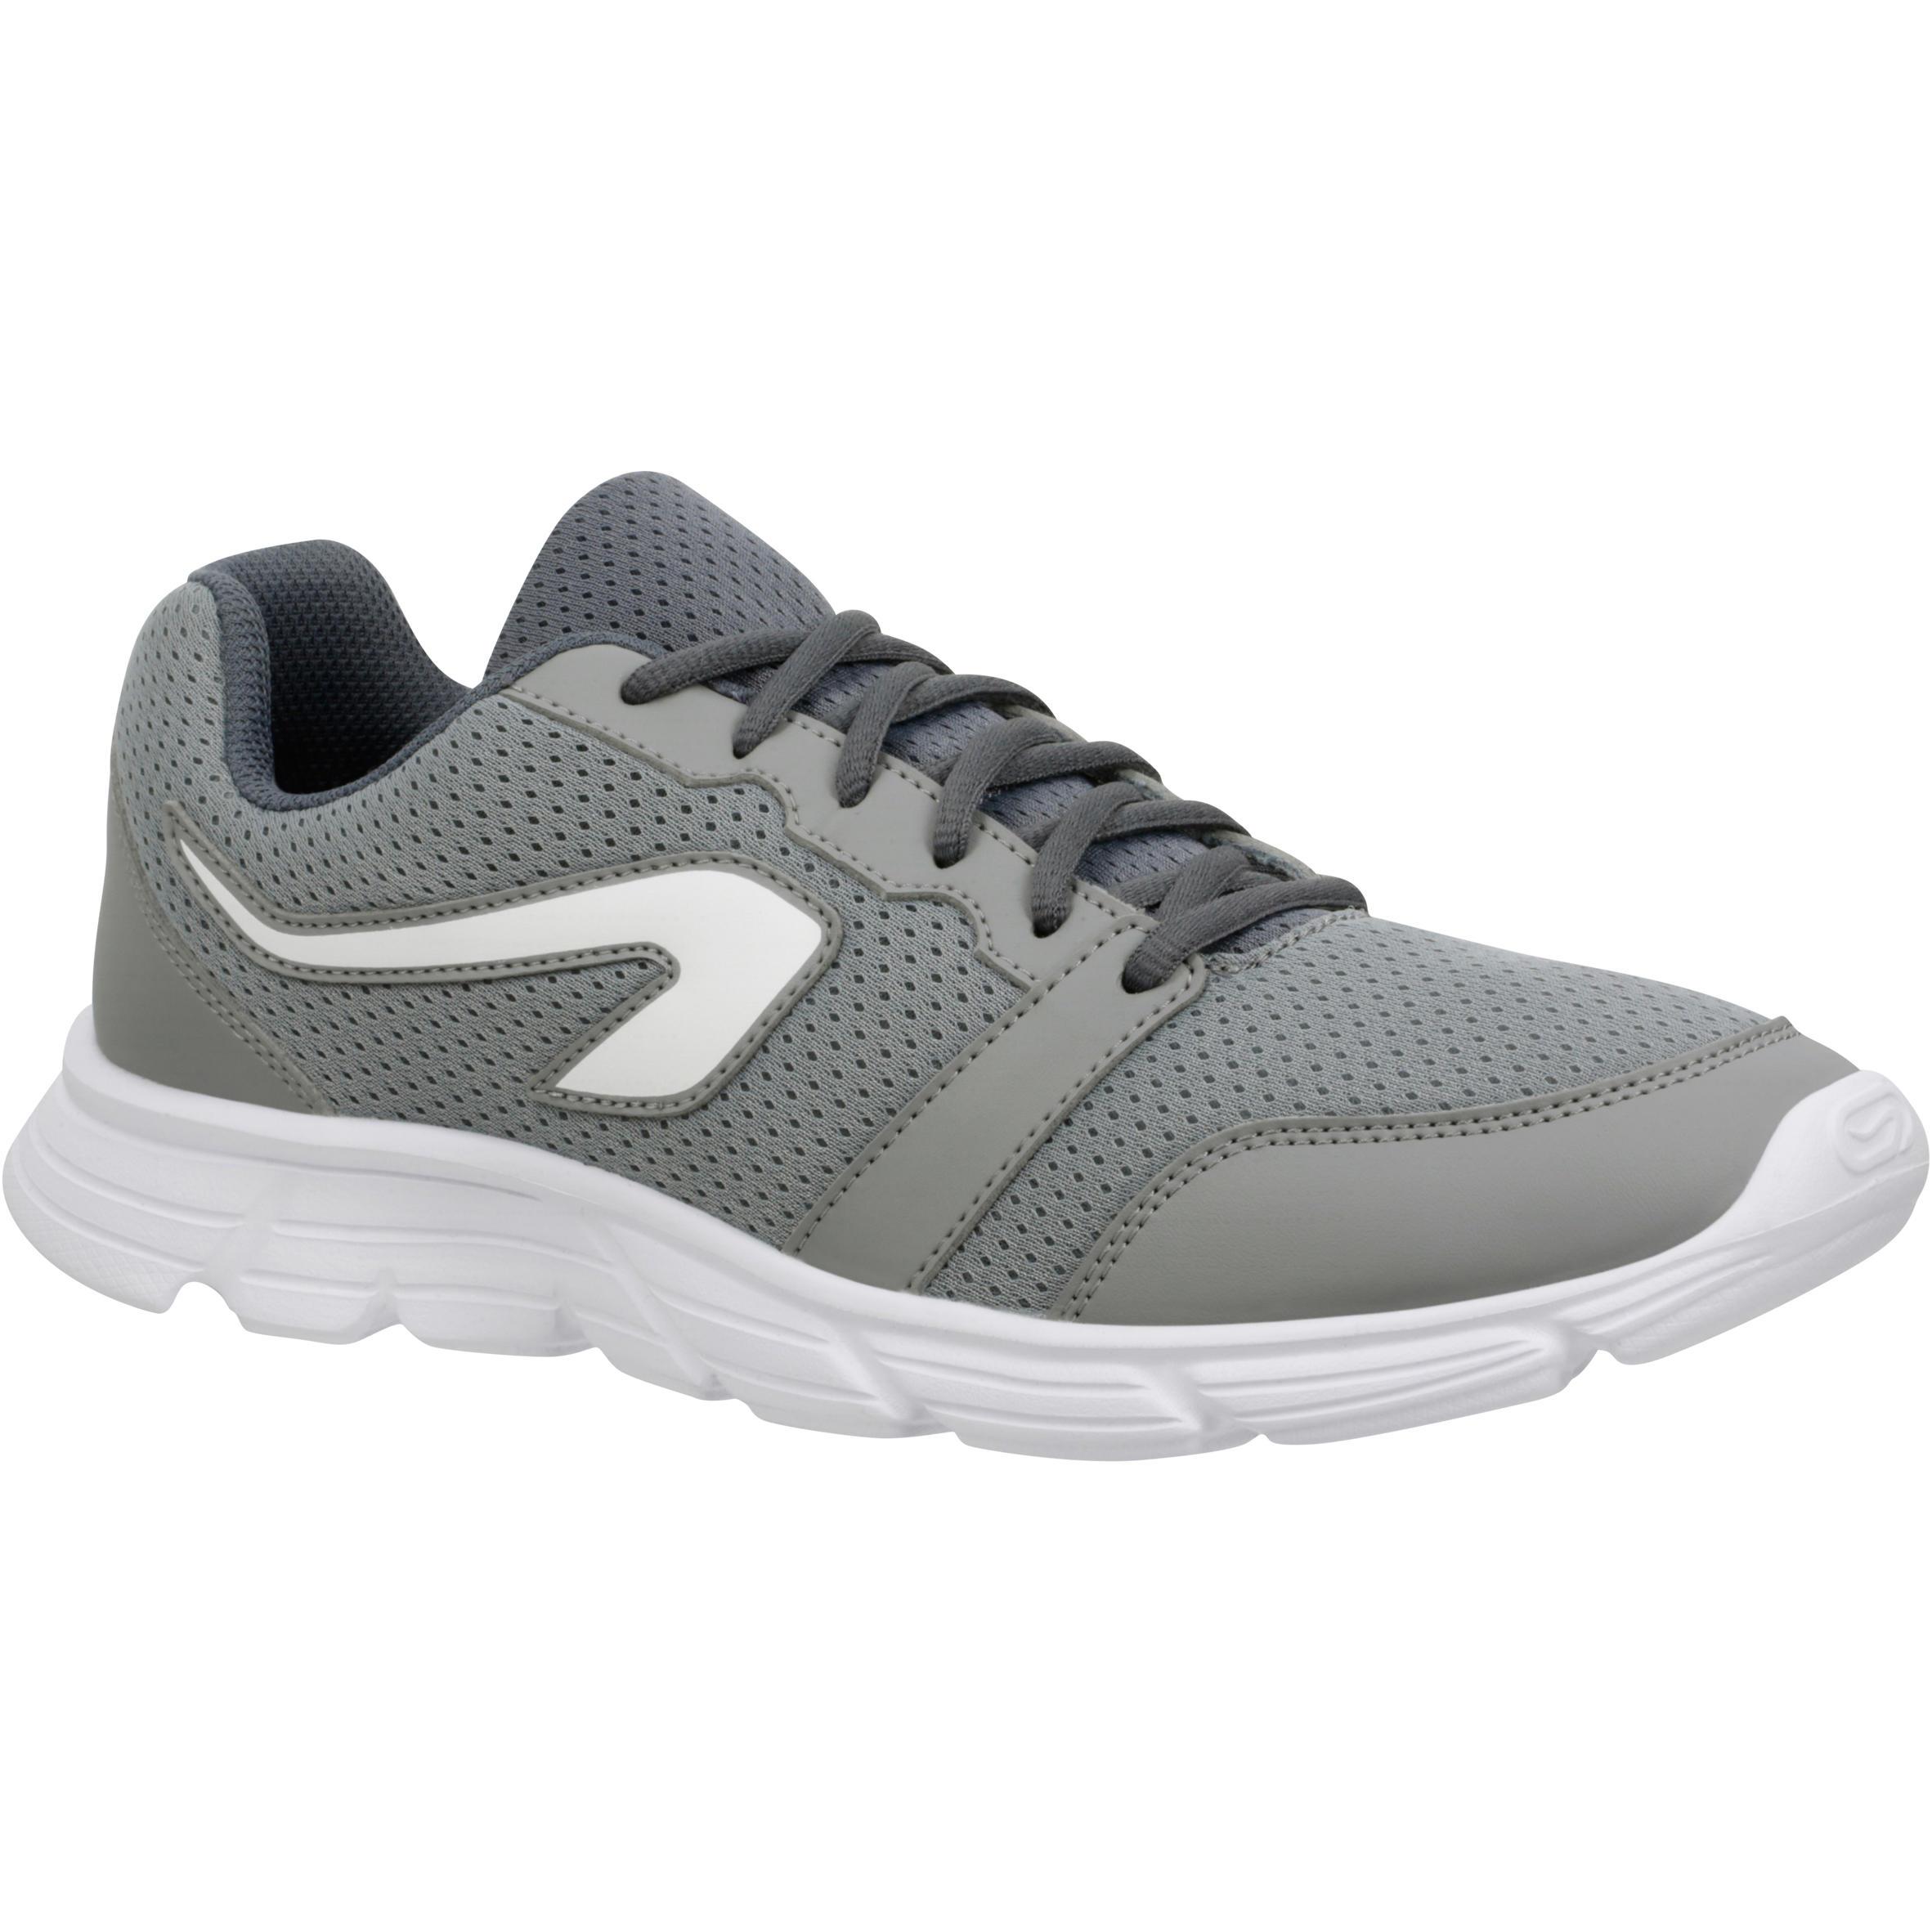 And Jogging Women ShoesBuy Online Men For l1F3TKcJ